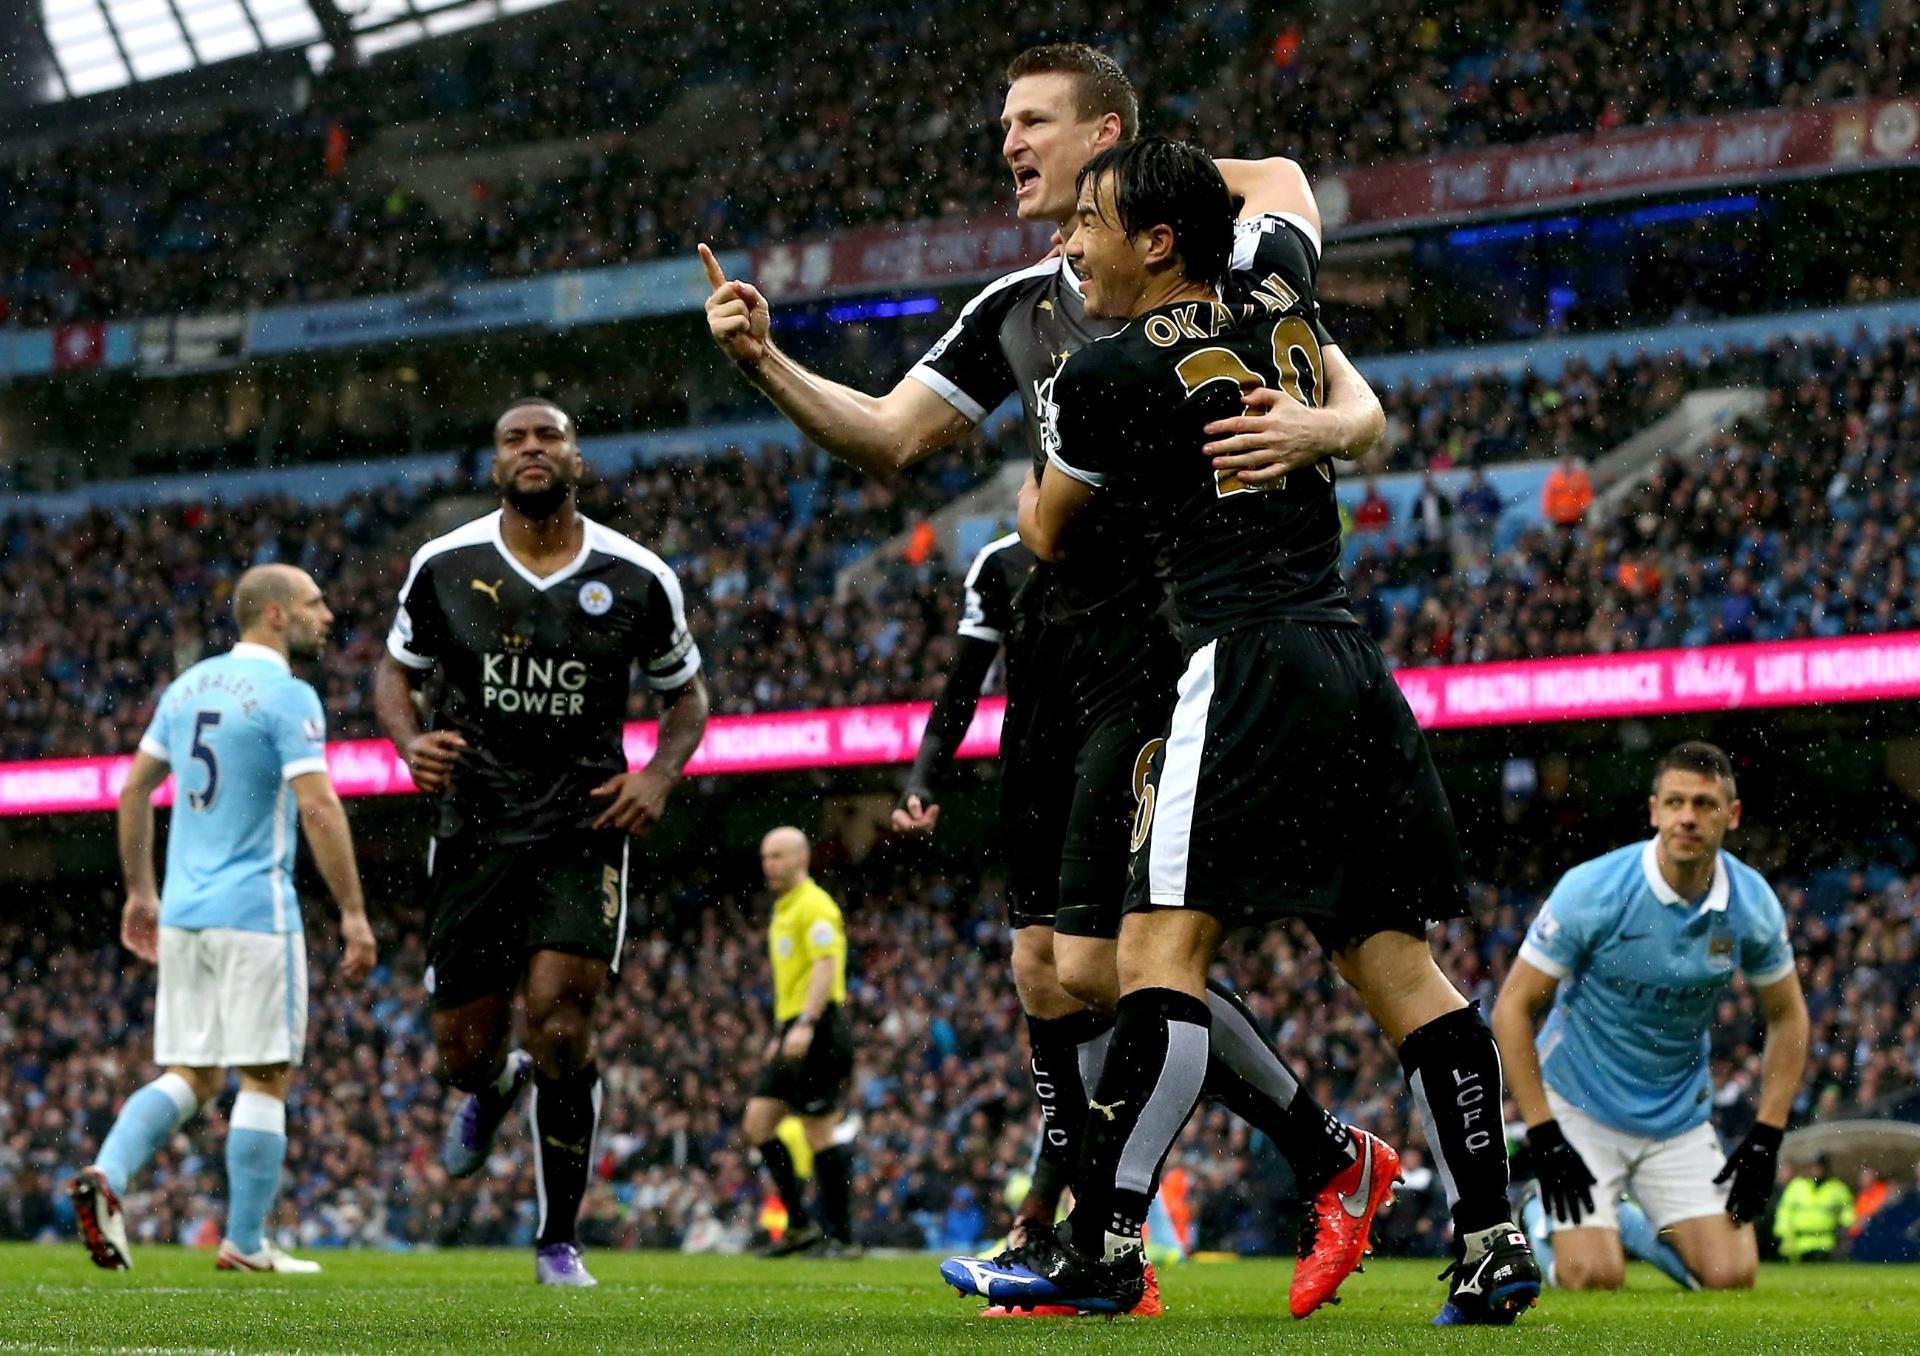 d1a9bb777d Robert Huth comemora gol do Leicester City contra o Manchester City no  Etihad Stadium pelo Campeonato